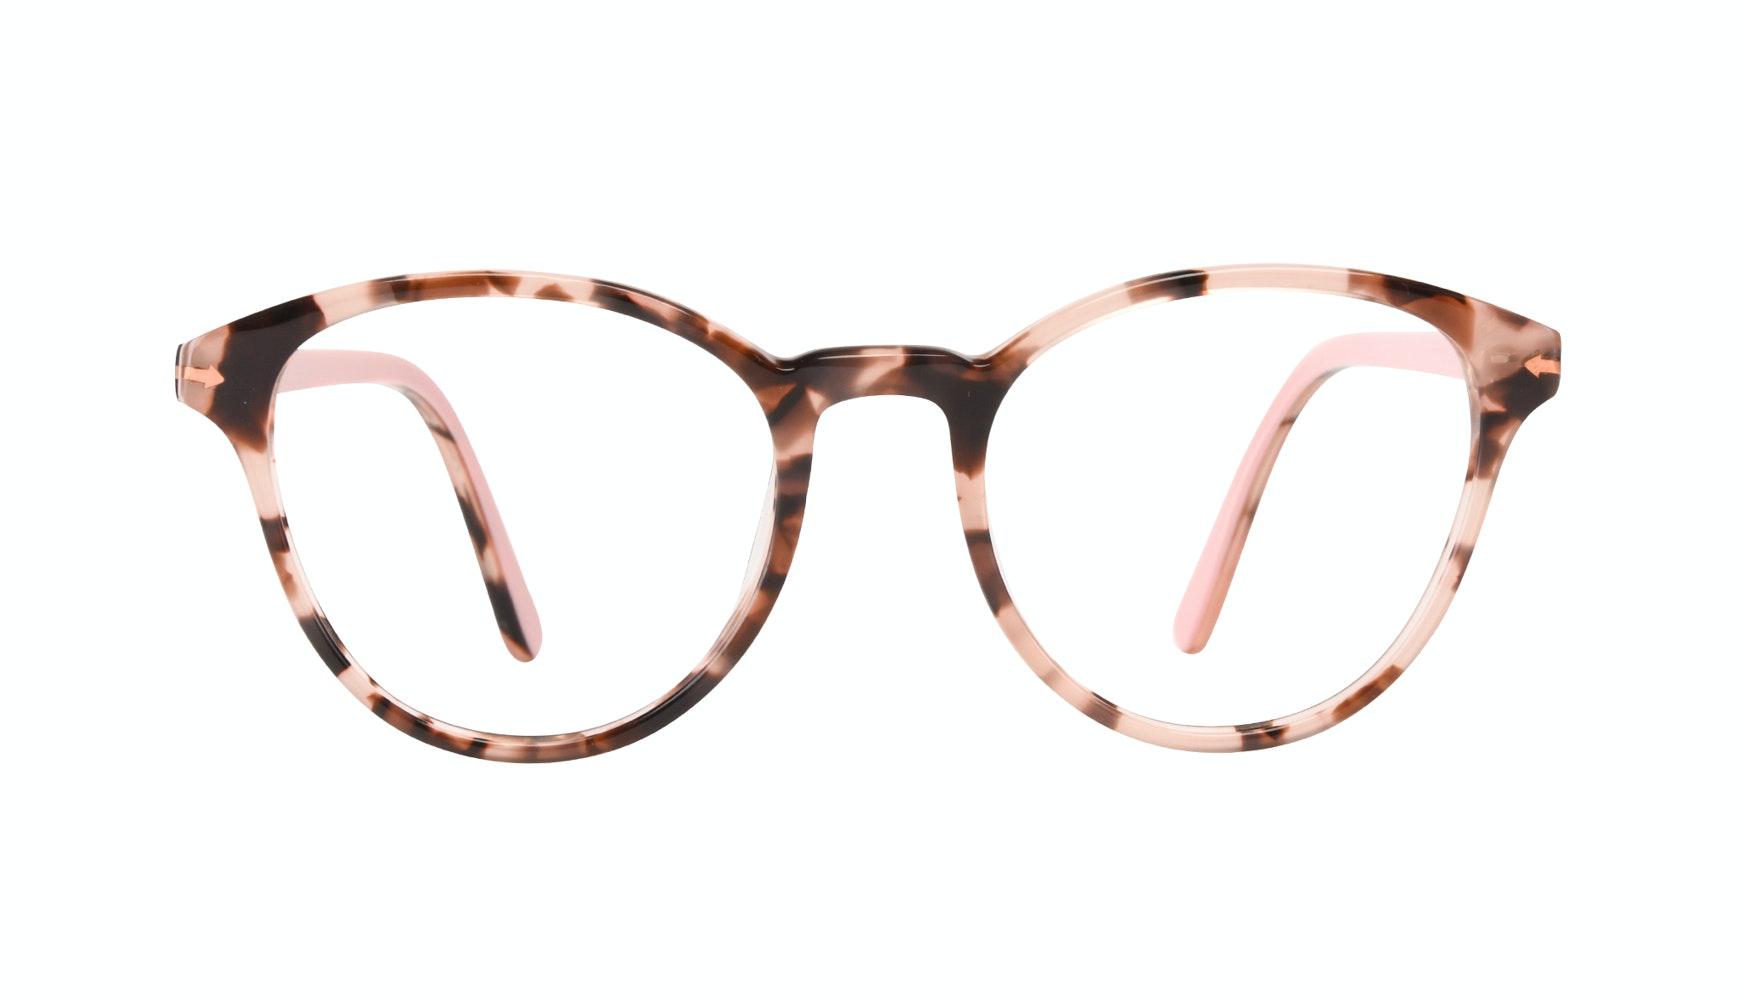 Affordable Fashion Glasses Round Eyeglasses Women London Wisteria